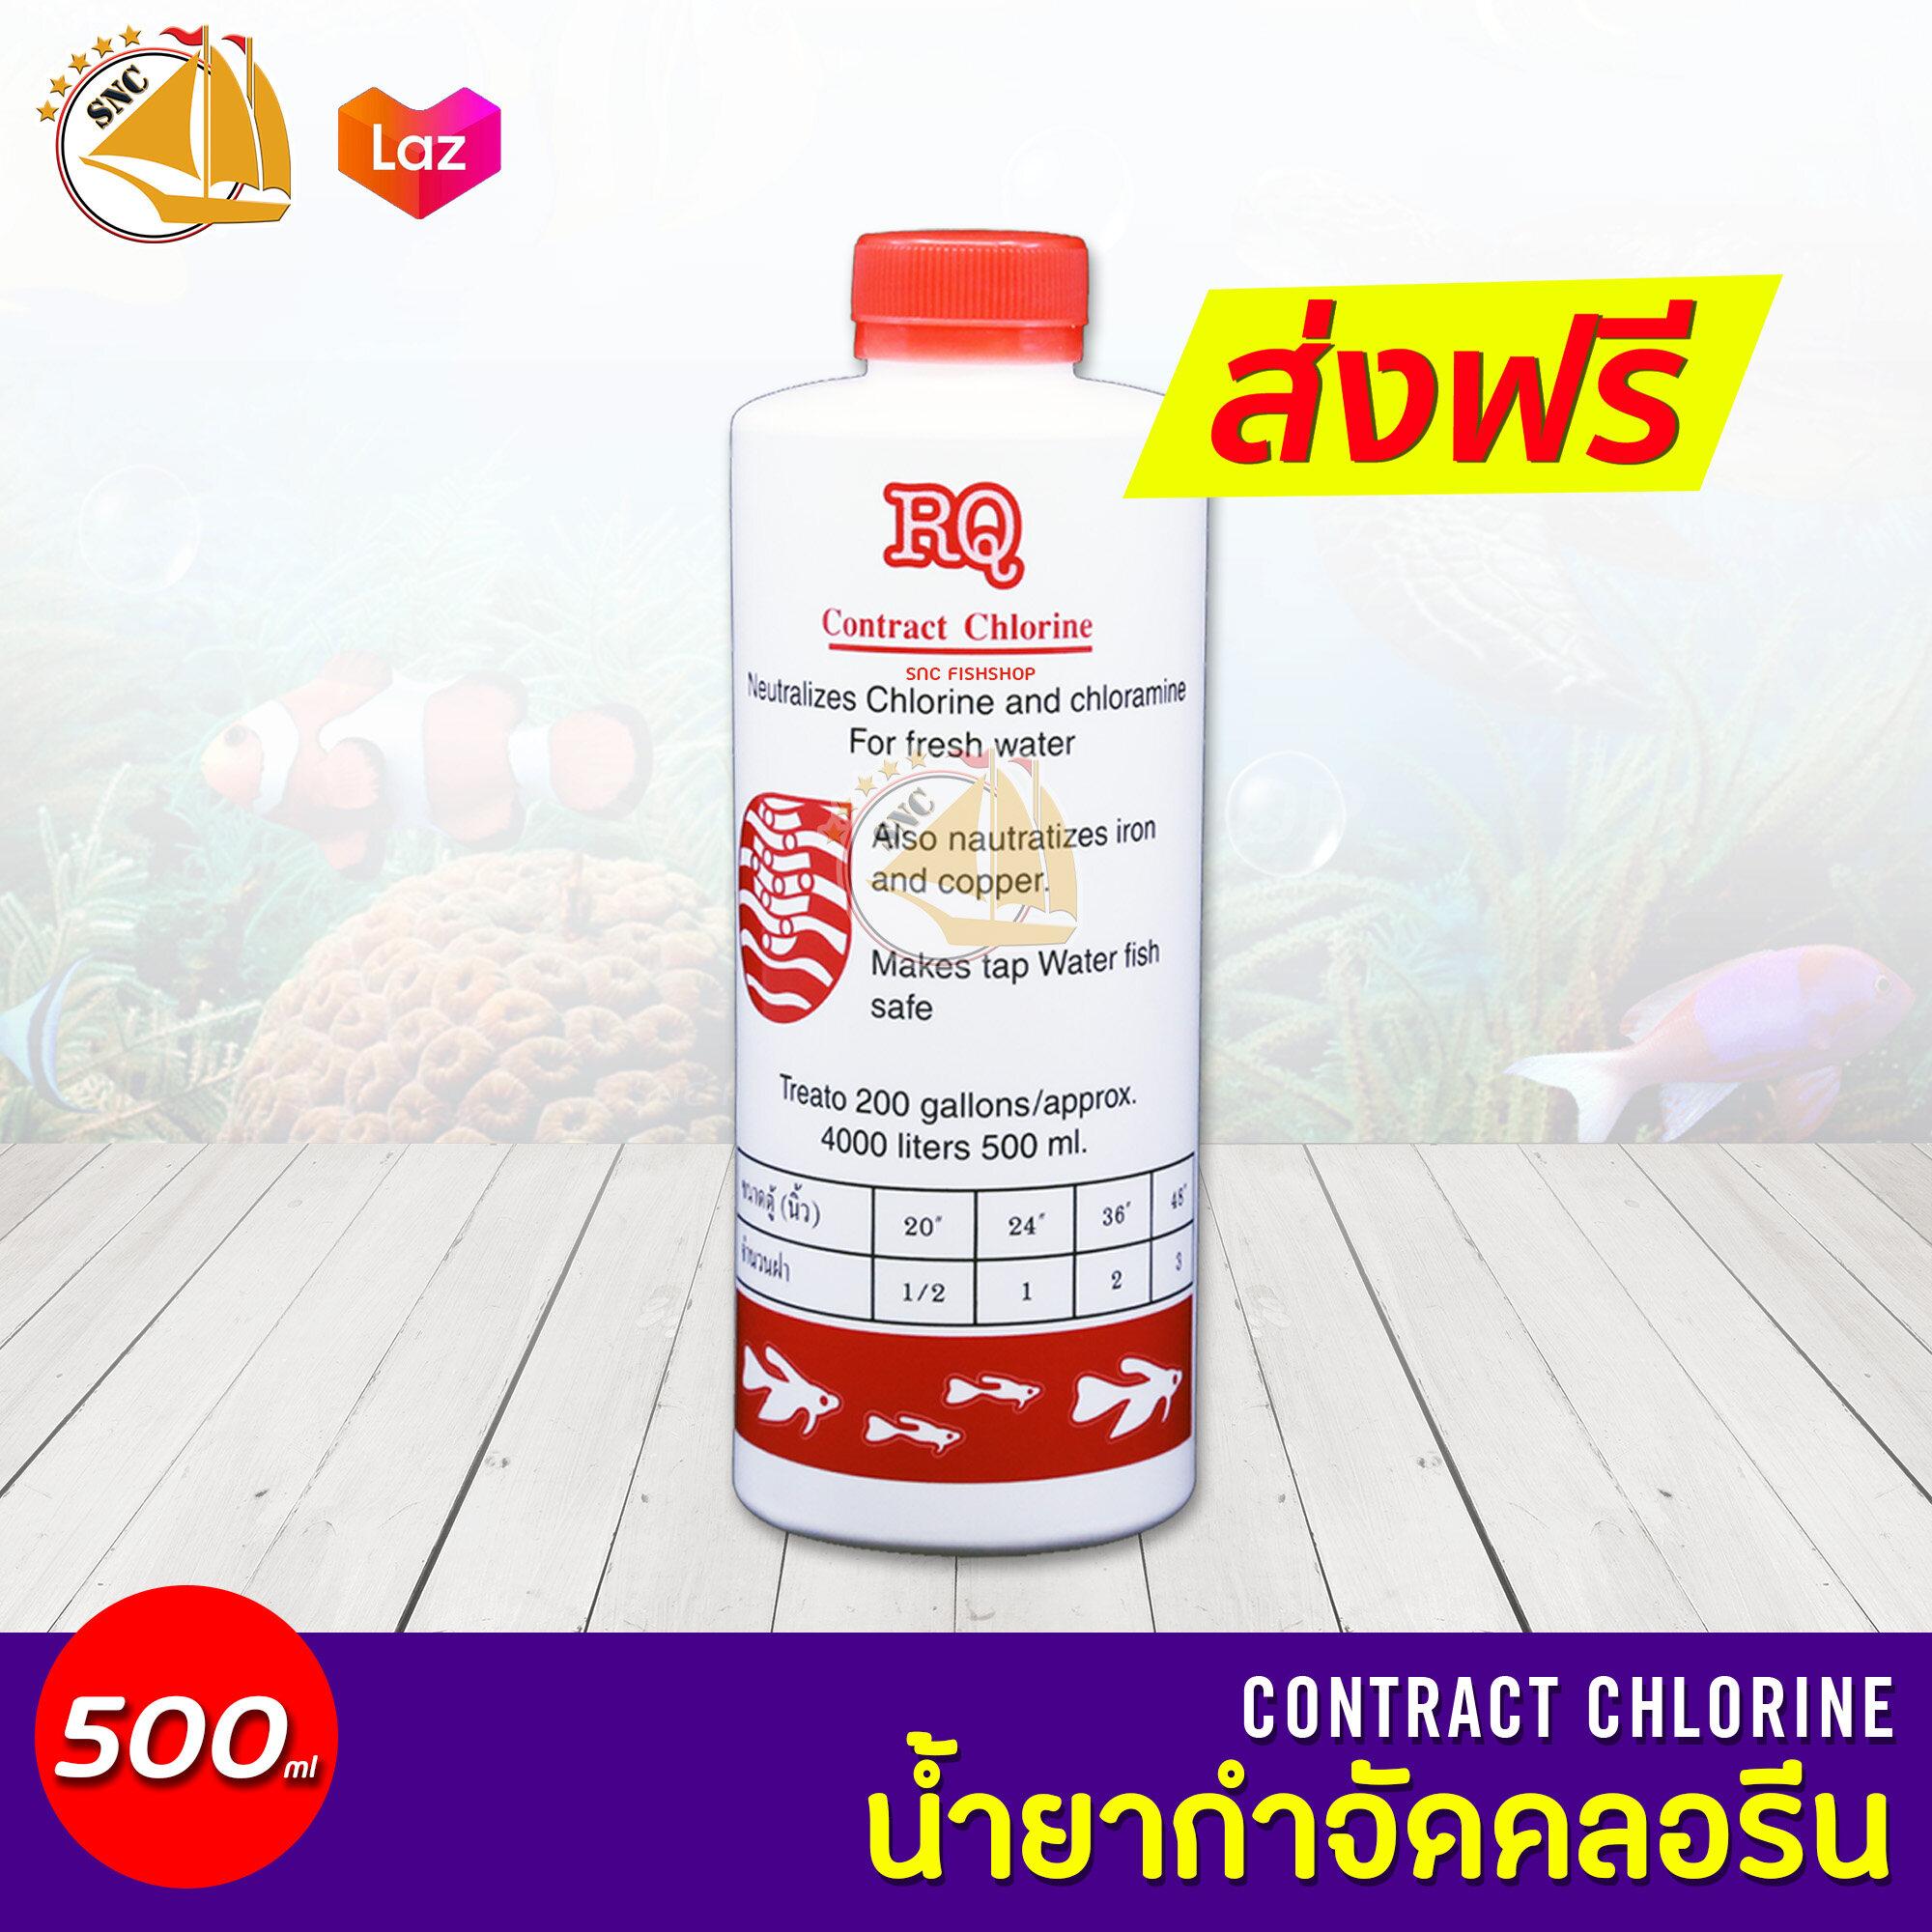 RQ น้ำยากำจัดคลอรีน ลดคลอรีน ปรับสภาพน้ำ 500ml 1ขวด